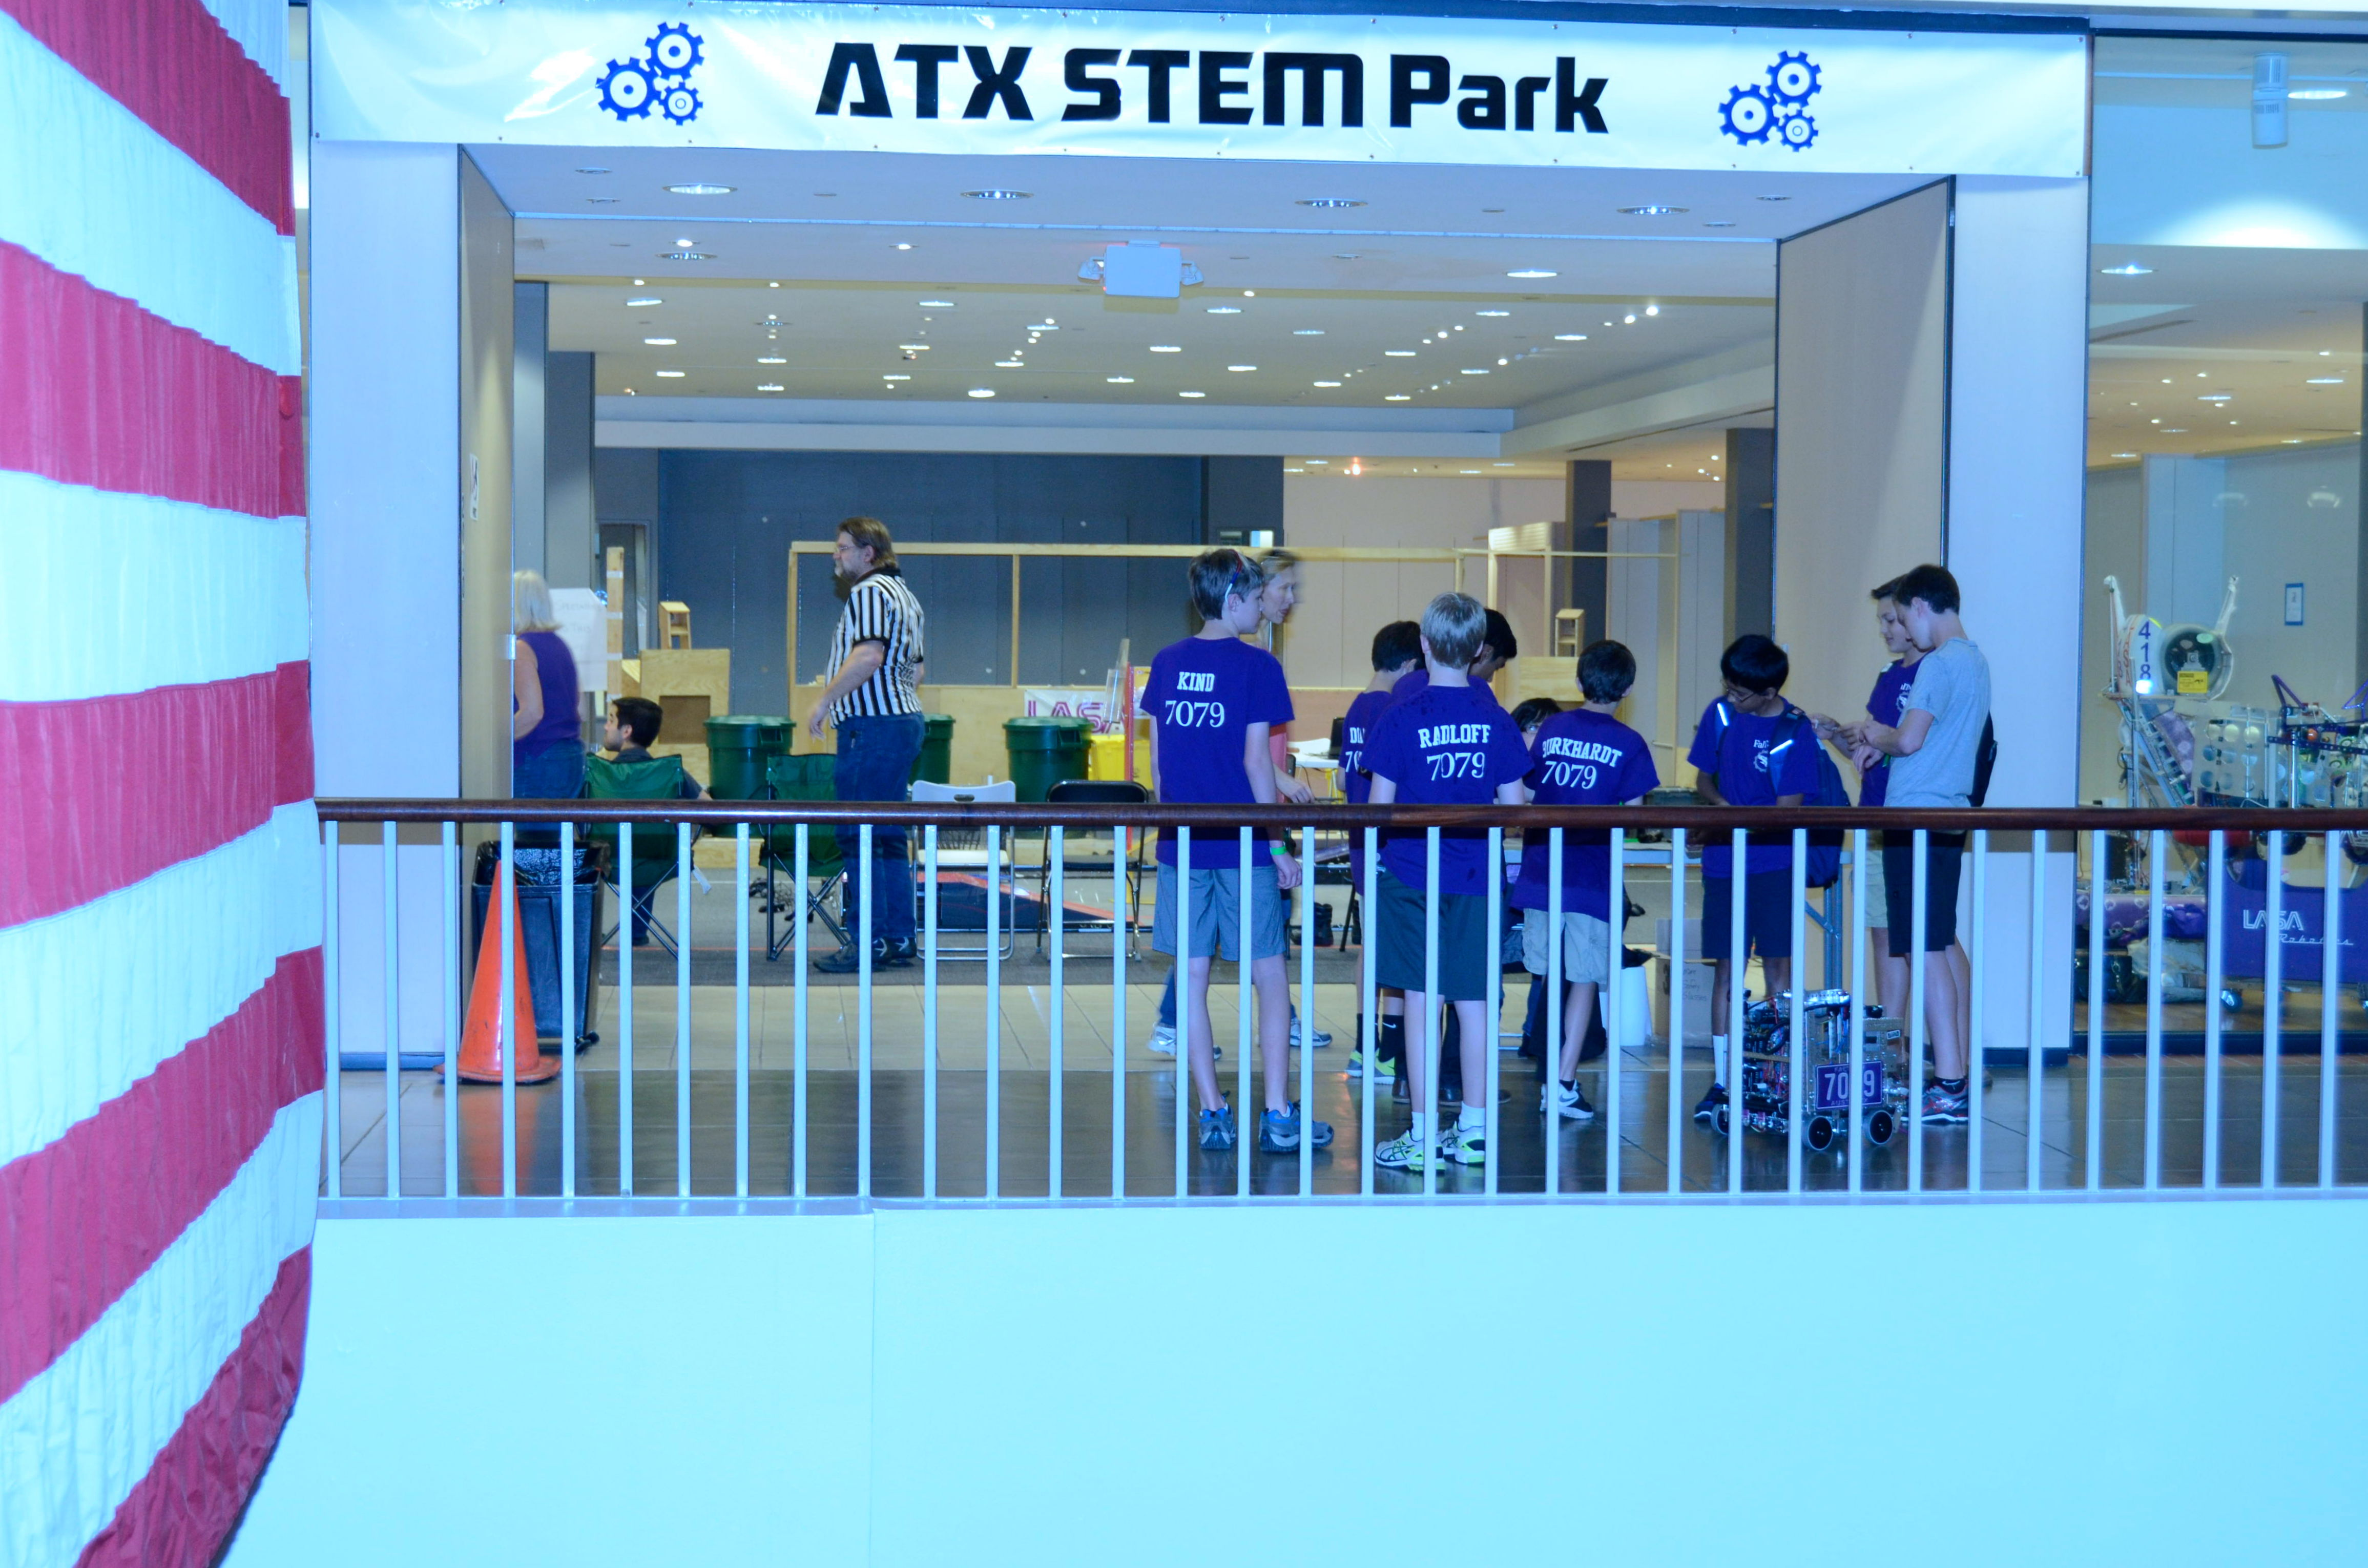 atx stem park